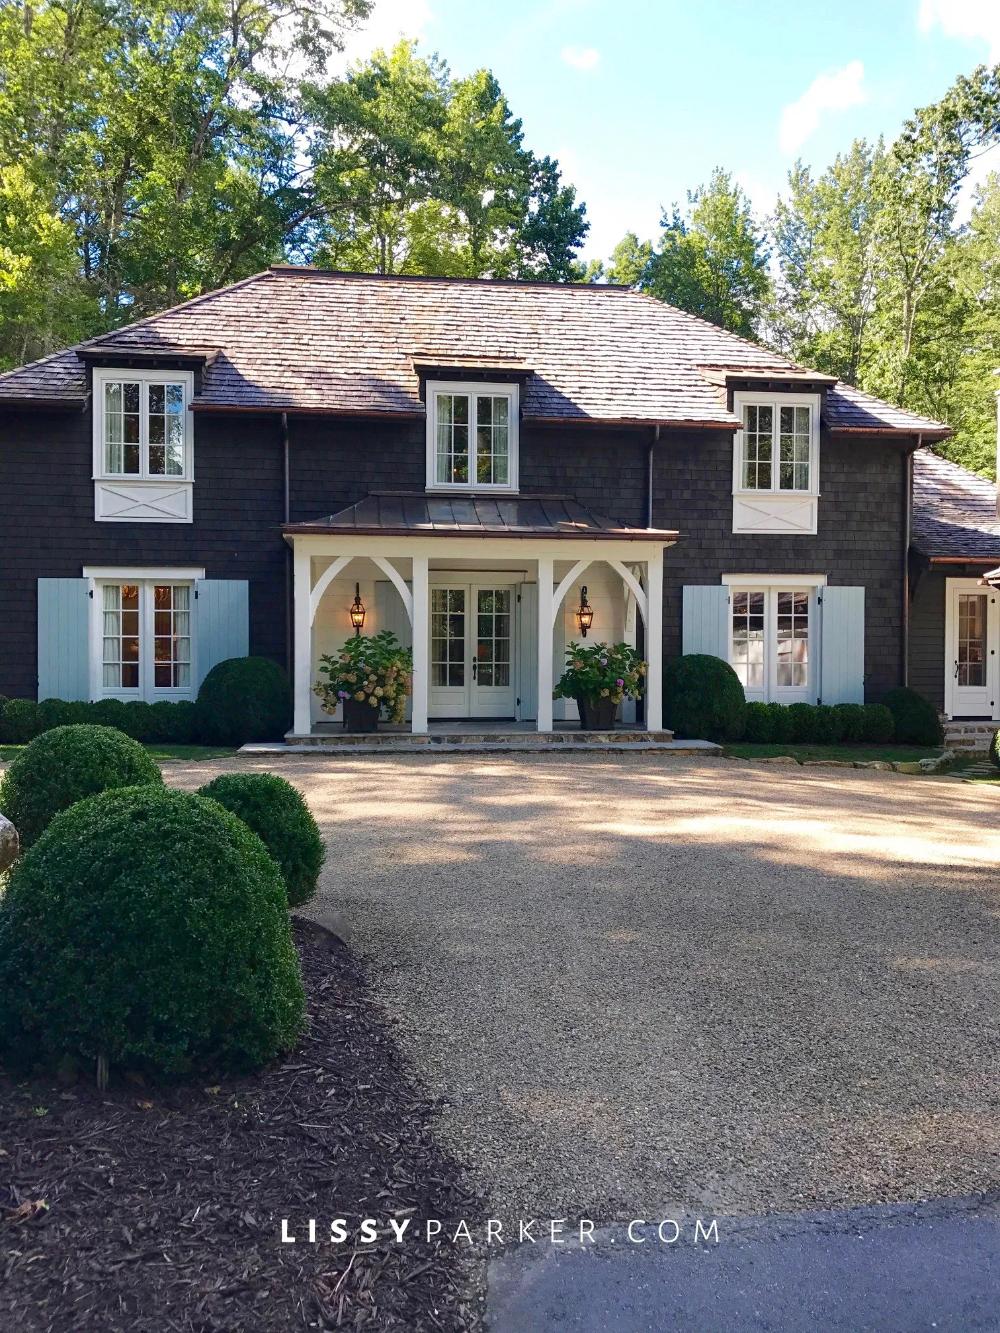 Best House Crush N° 35 – Lissyparker Com In 2020 Shingle 400 x 300